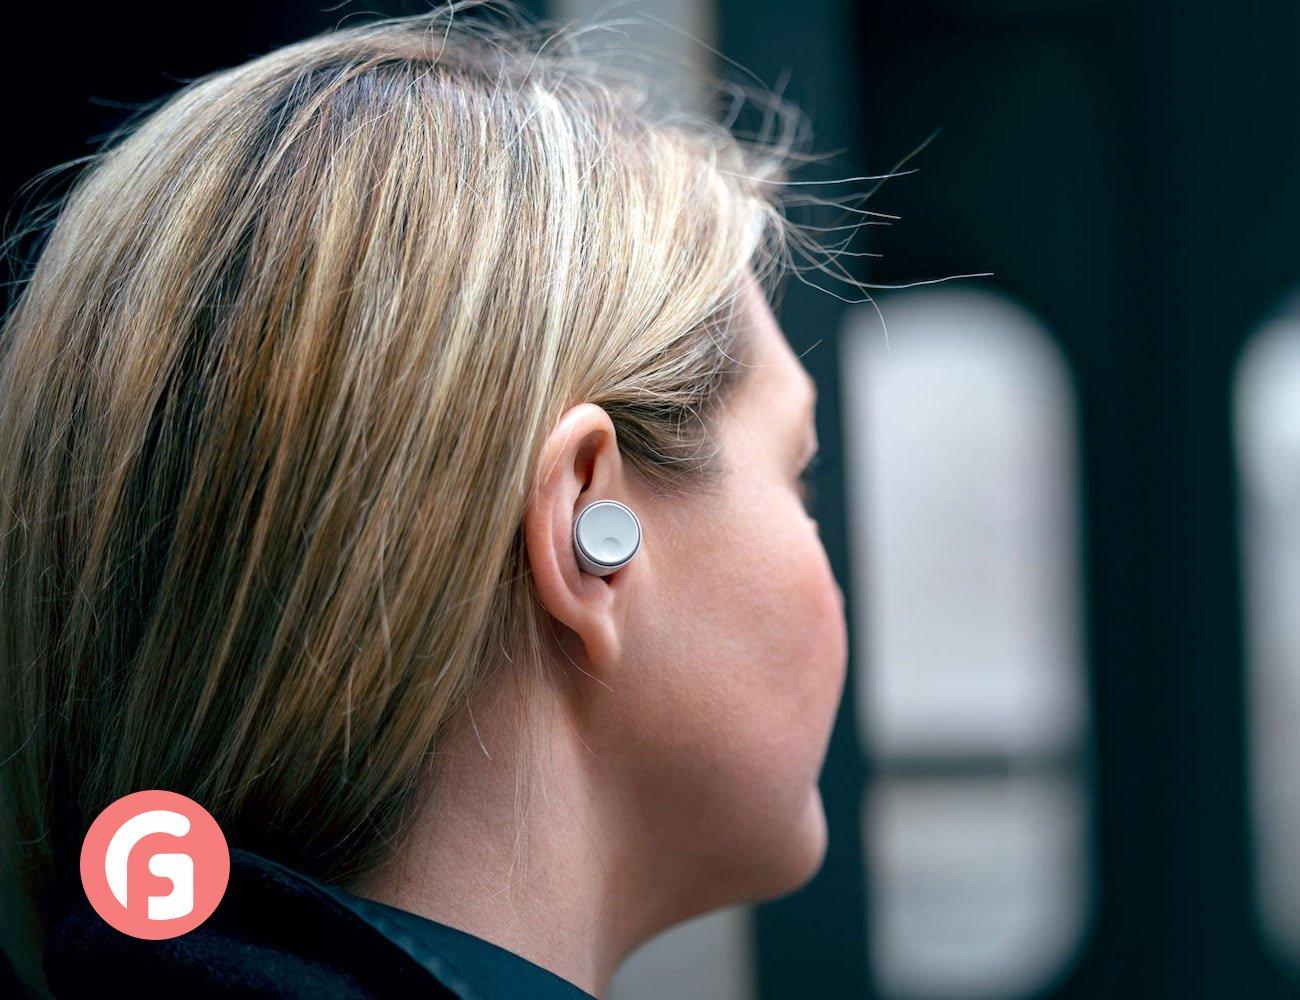 Cambridge Audio Melomania 1 Bluetooth Wireless Earphones provide 9 hours of playback